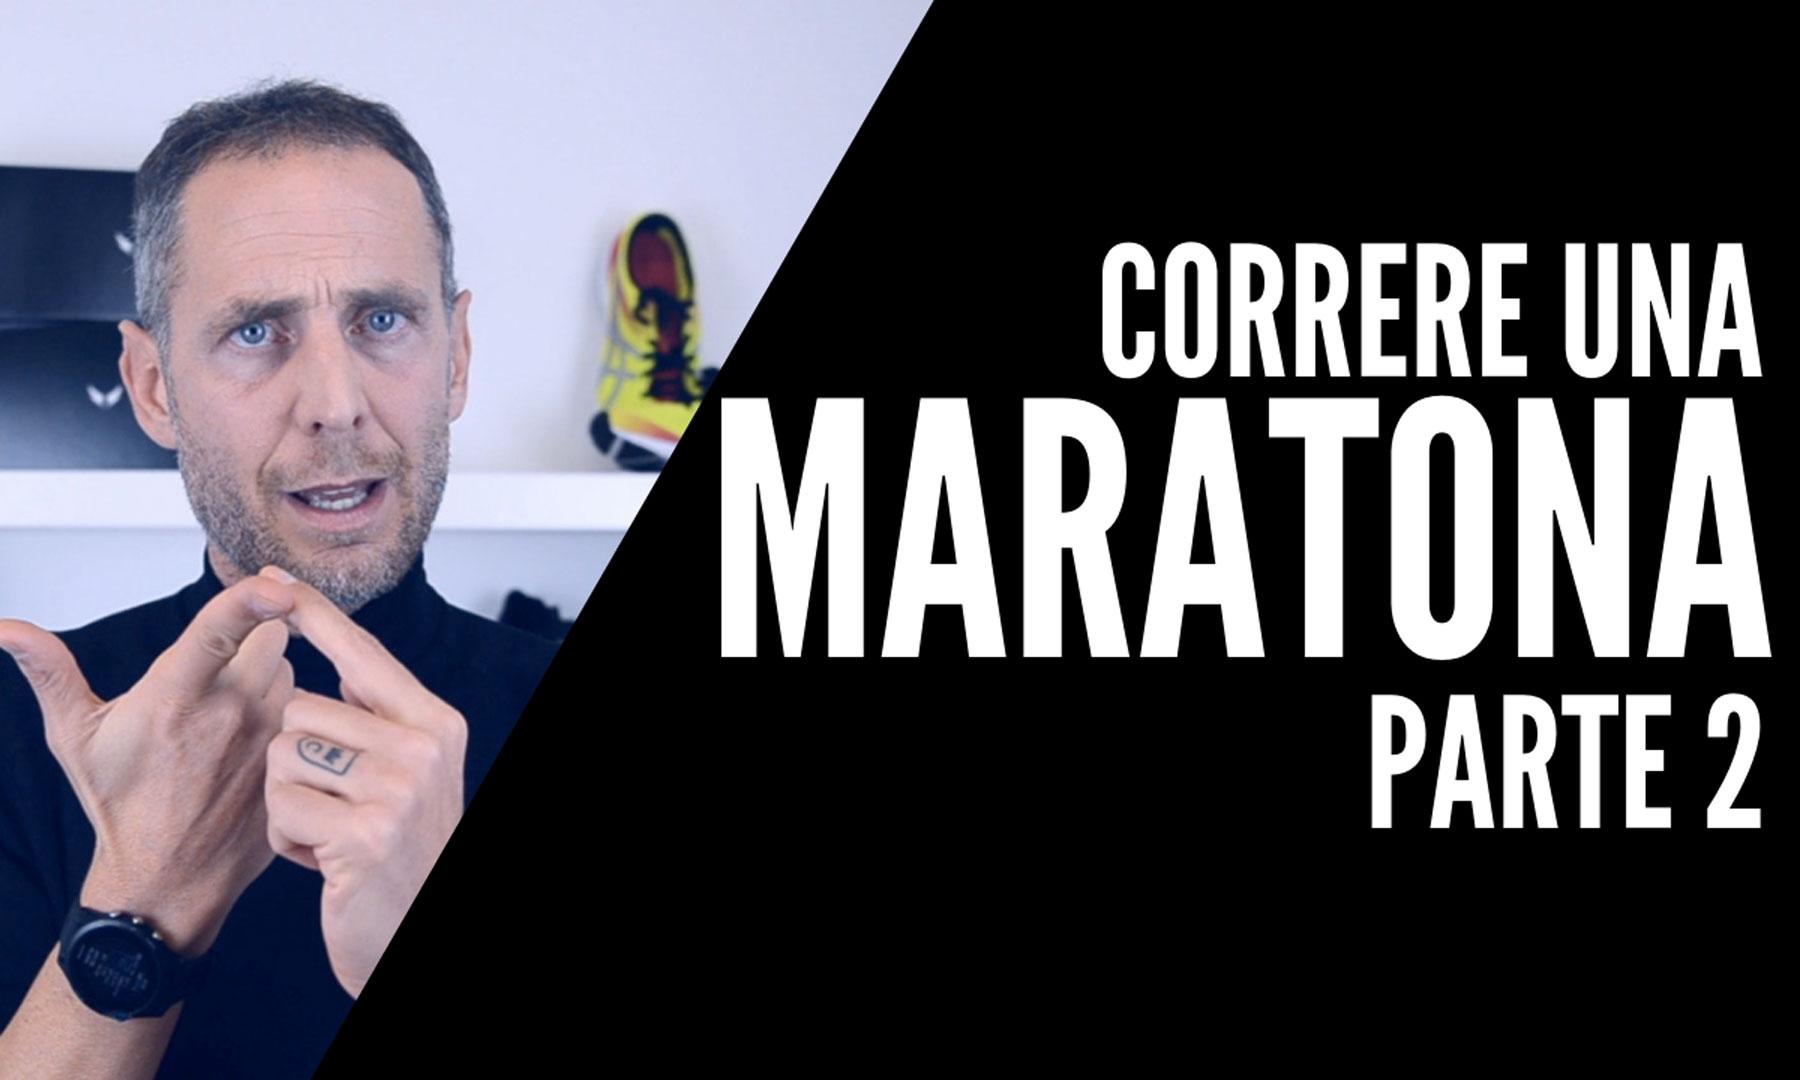 correre una maratona parte 2